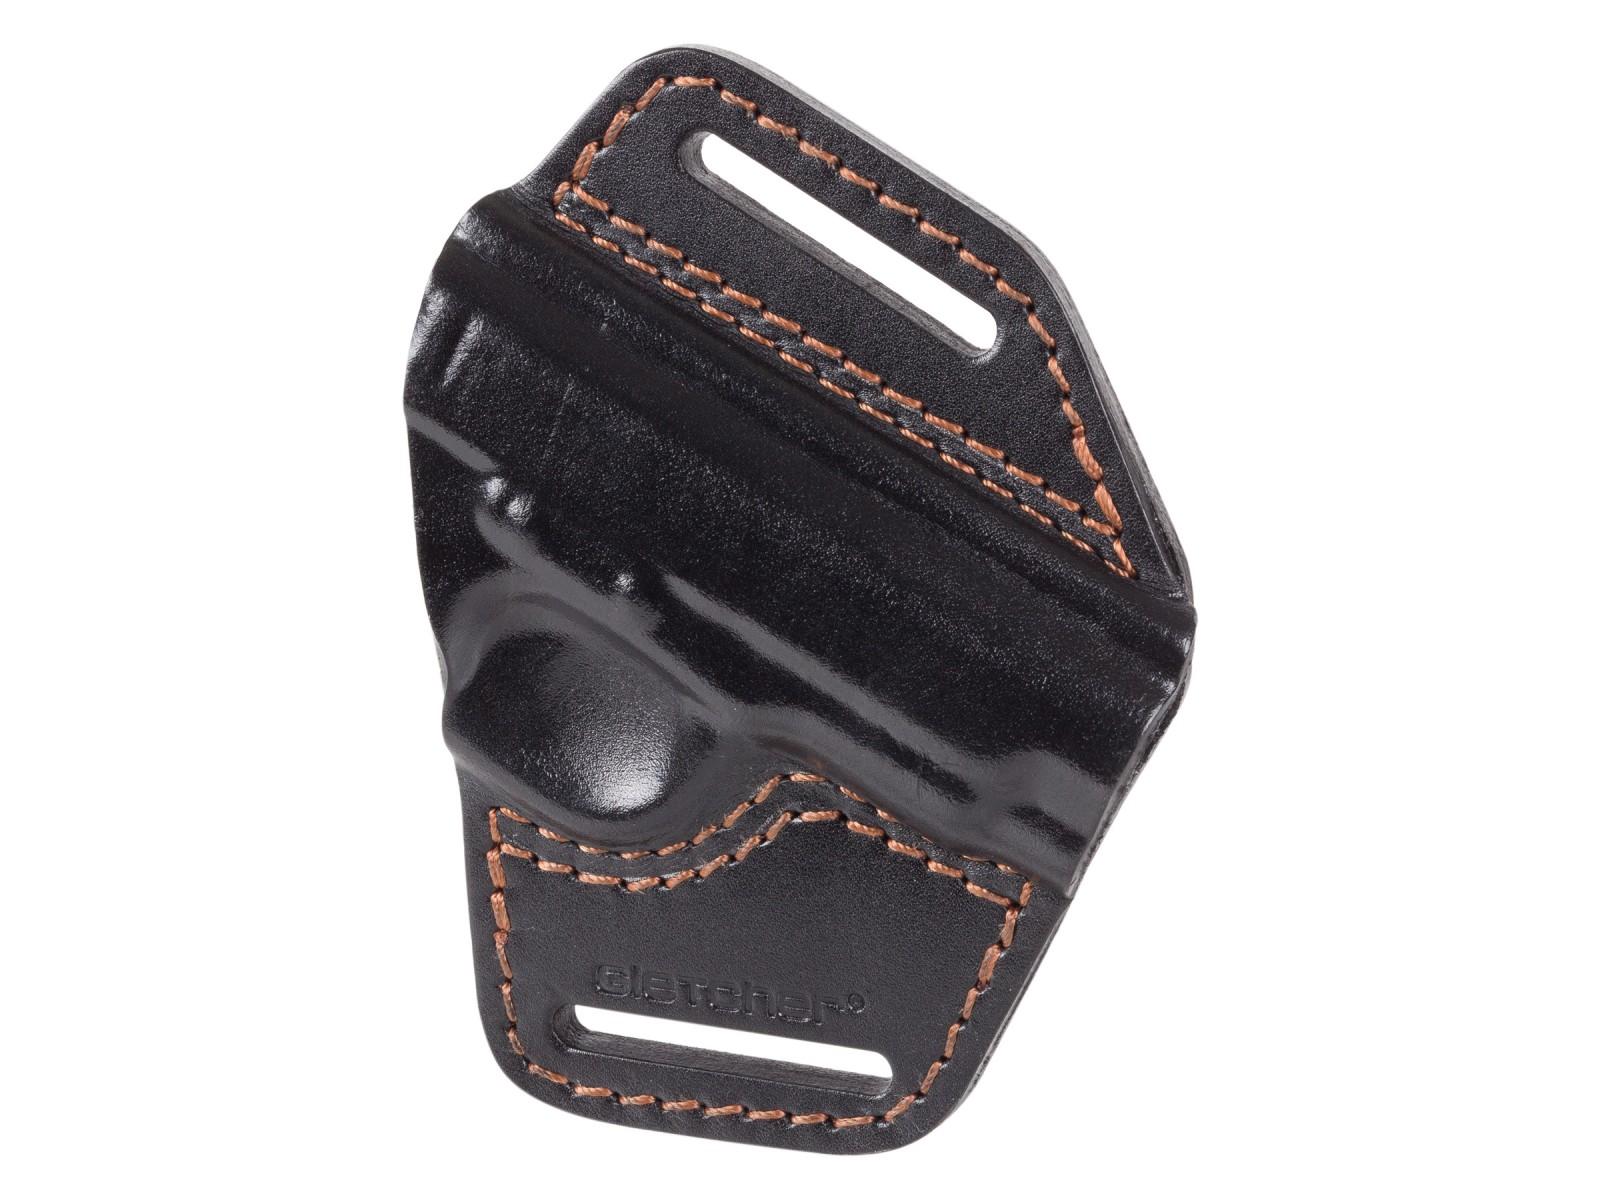 Gletcher TT Leather.